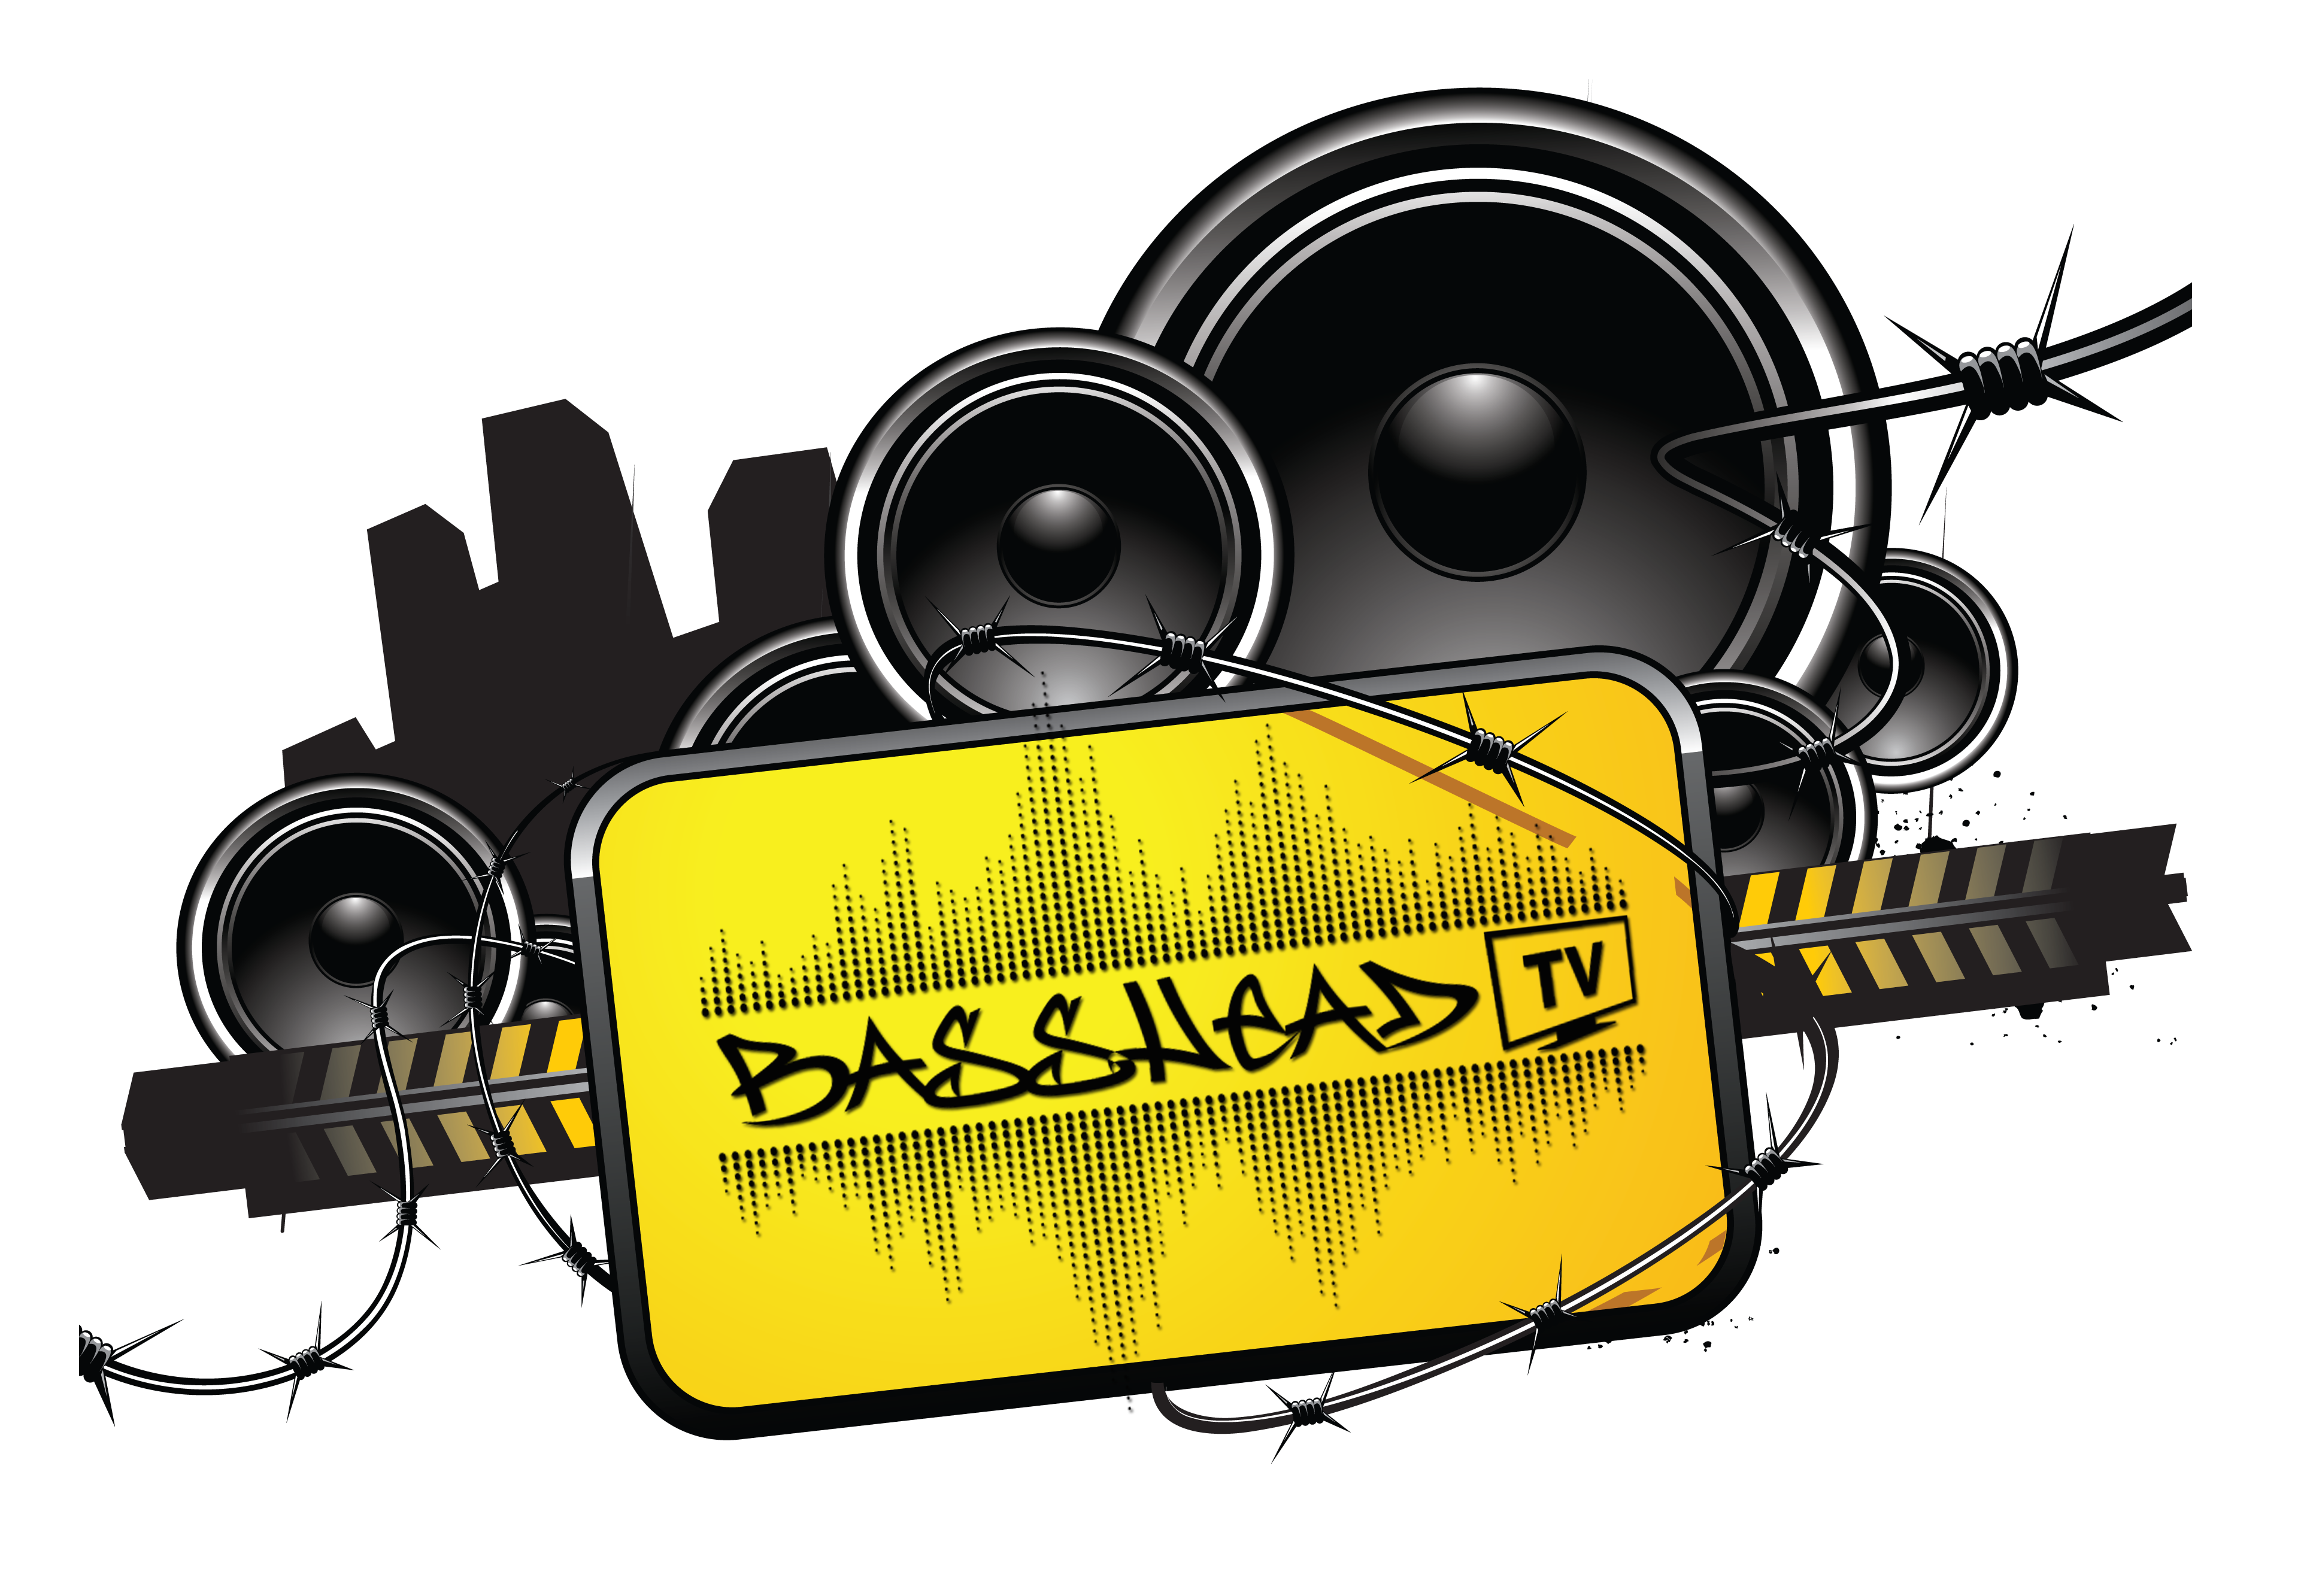 Bass head car audio clipart image freeuse Basshead TV – Follow us on social media #BassheadTV image freeuse